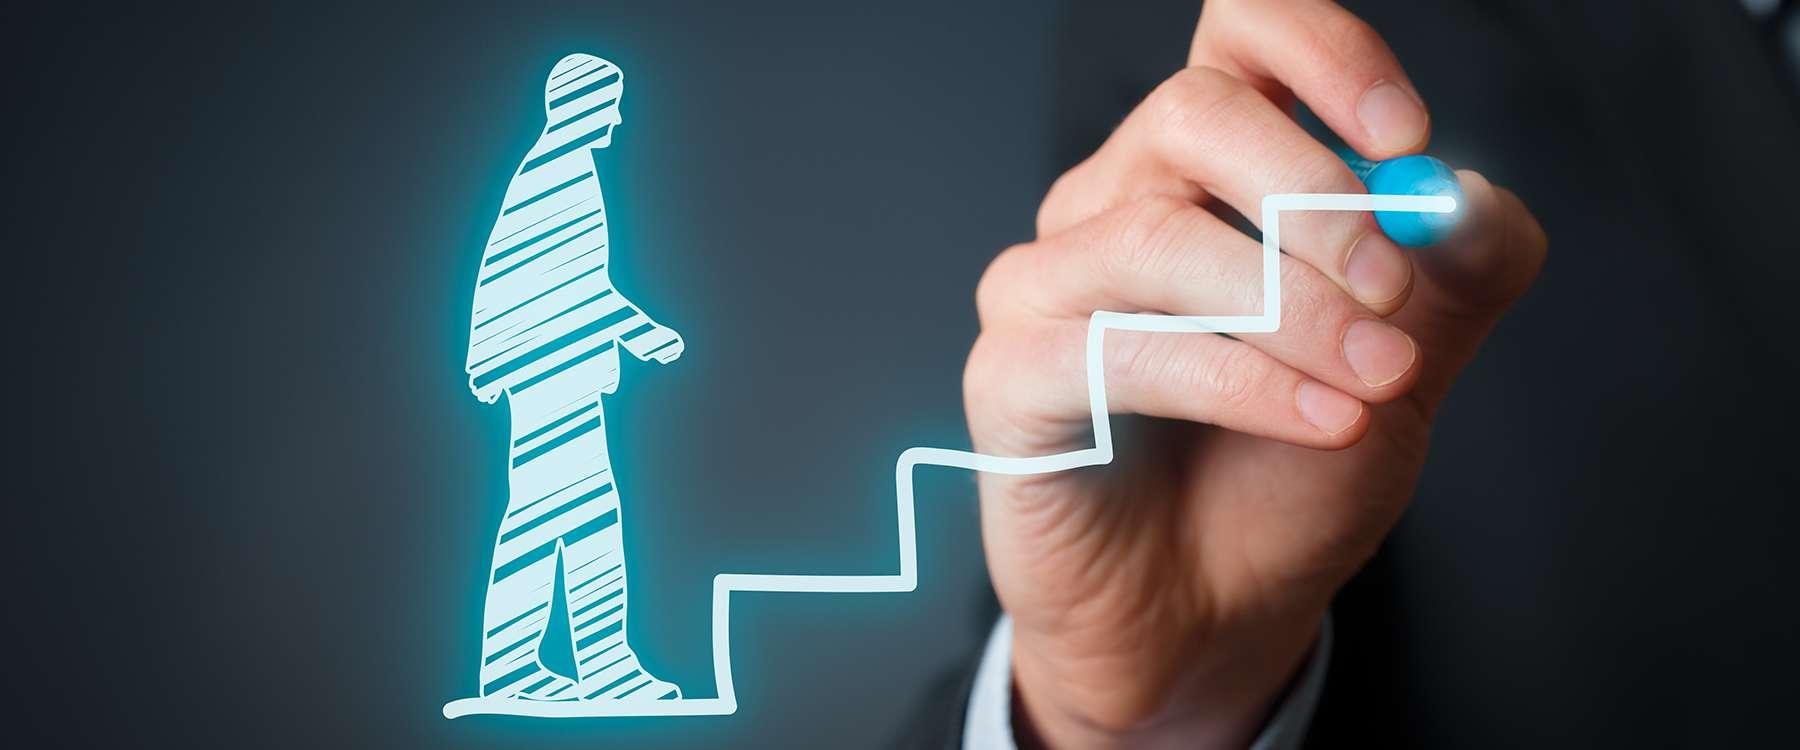 TRAINING TENTANG CAREER DEVELOPMENT MANAGEMENT